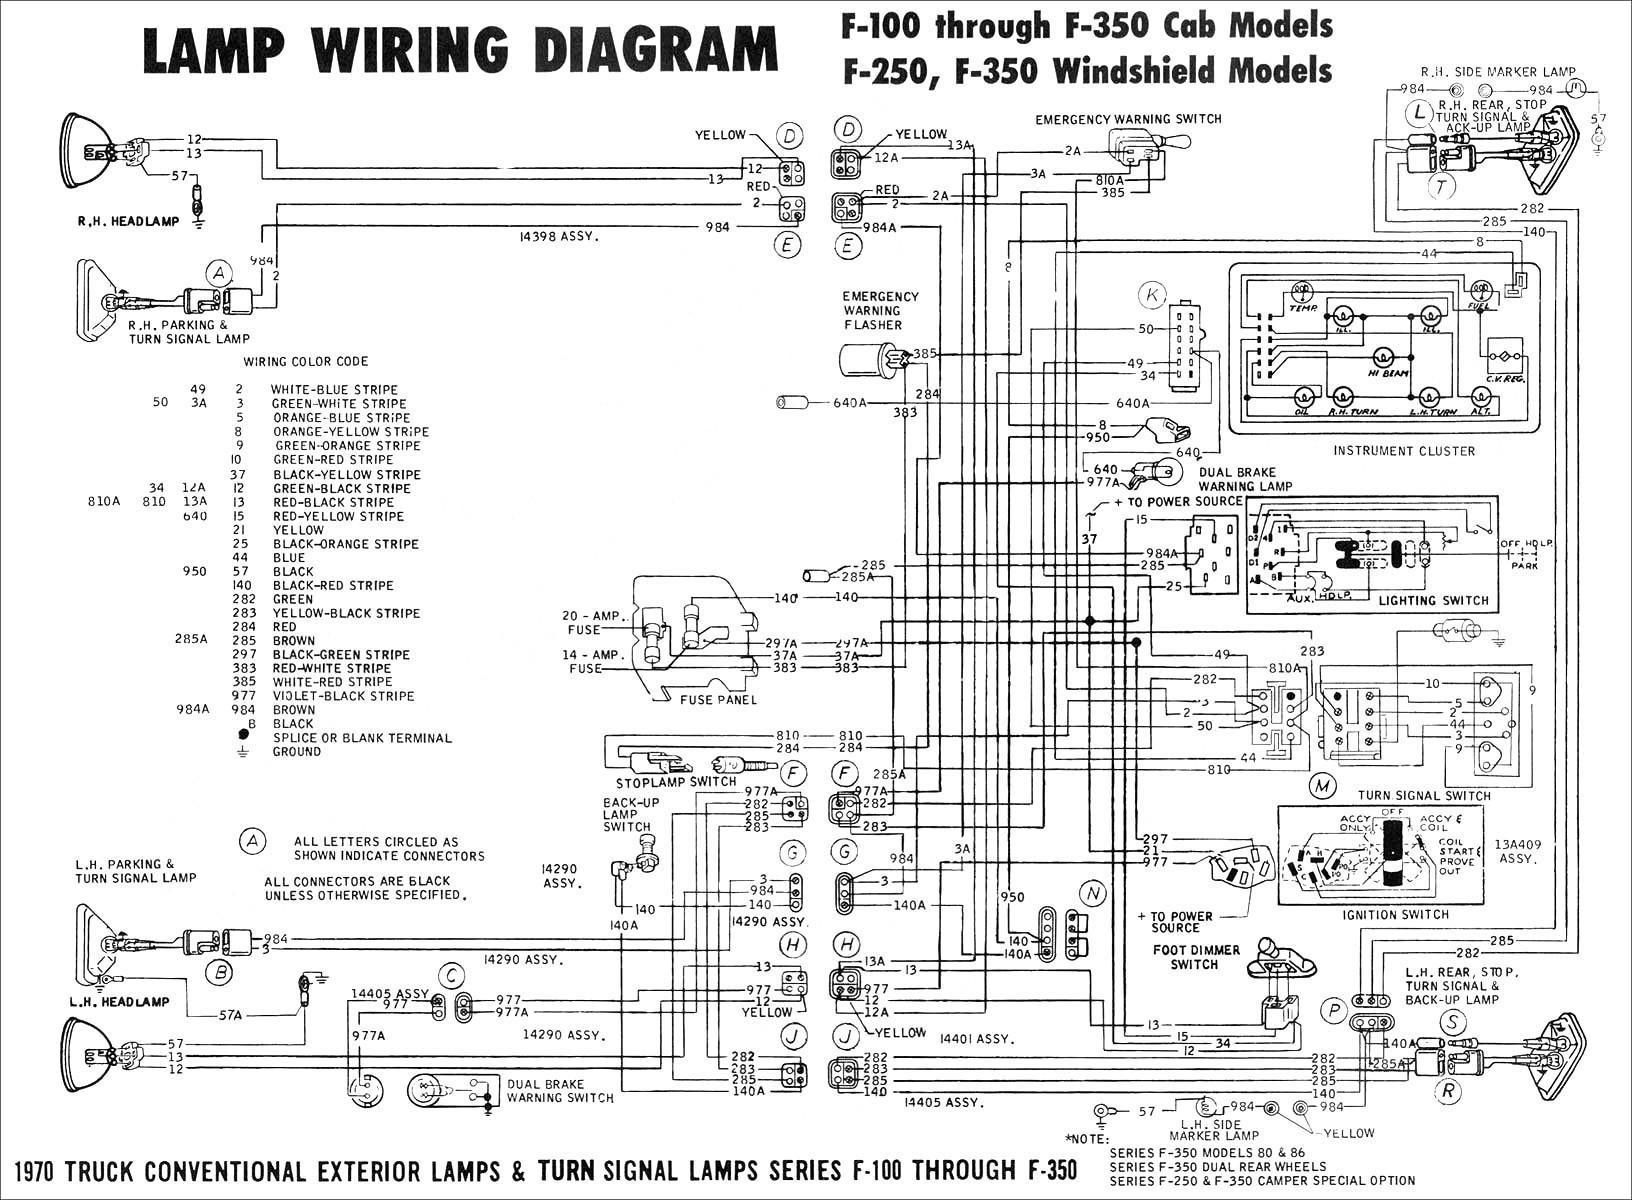 2005 Hyundai Elantra Engine Diagram Fb923d Wiring Diagram for 06 Hyundai Elantra Of 2005 Hyundai Elantra Engine Diagram